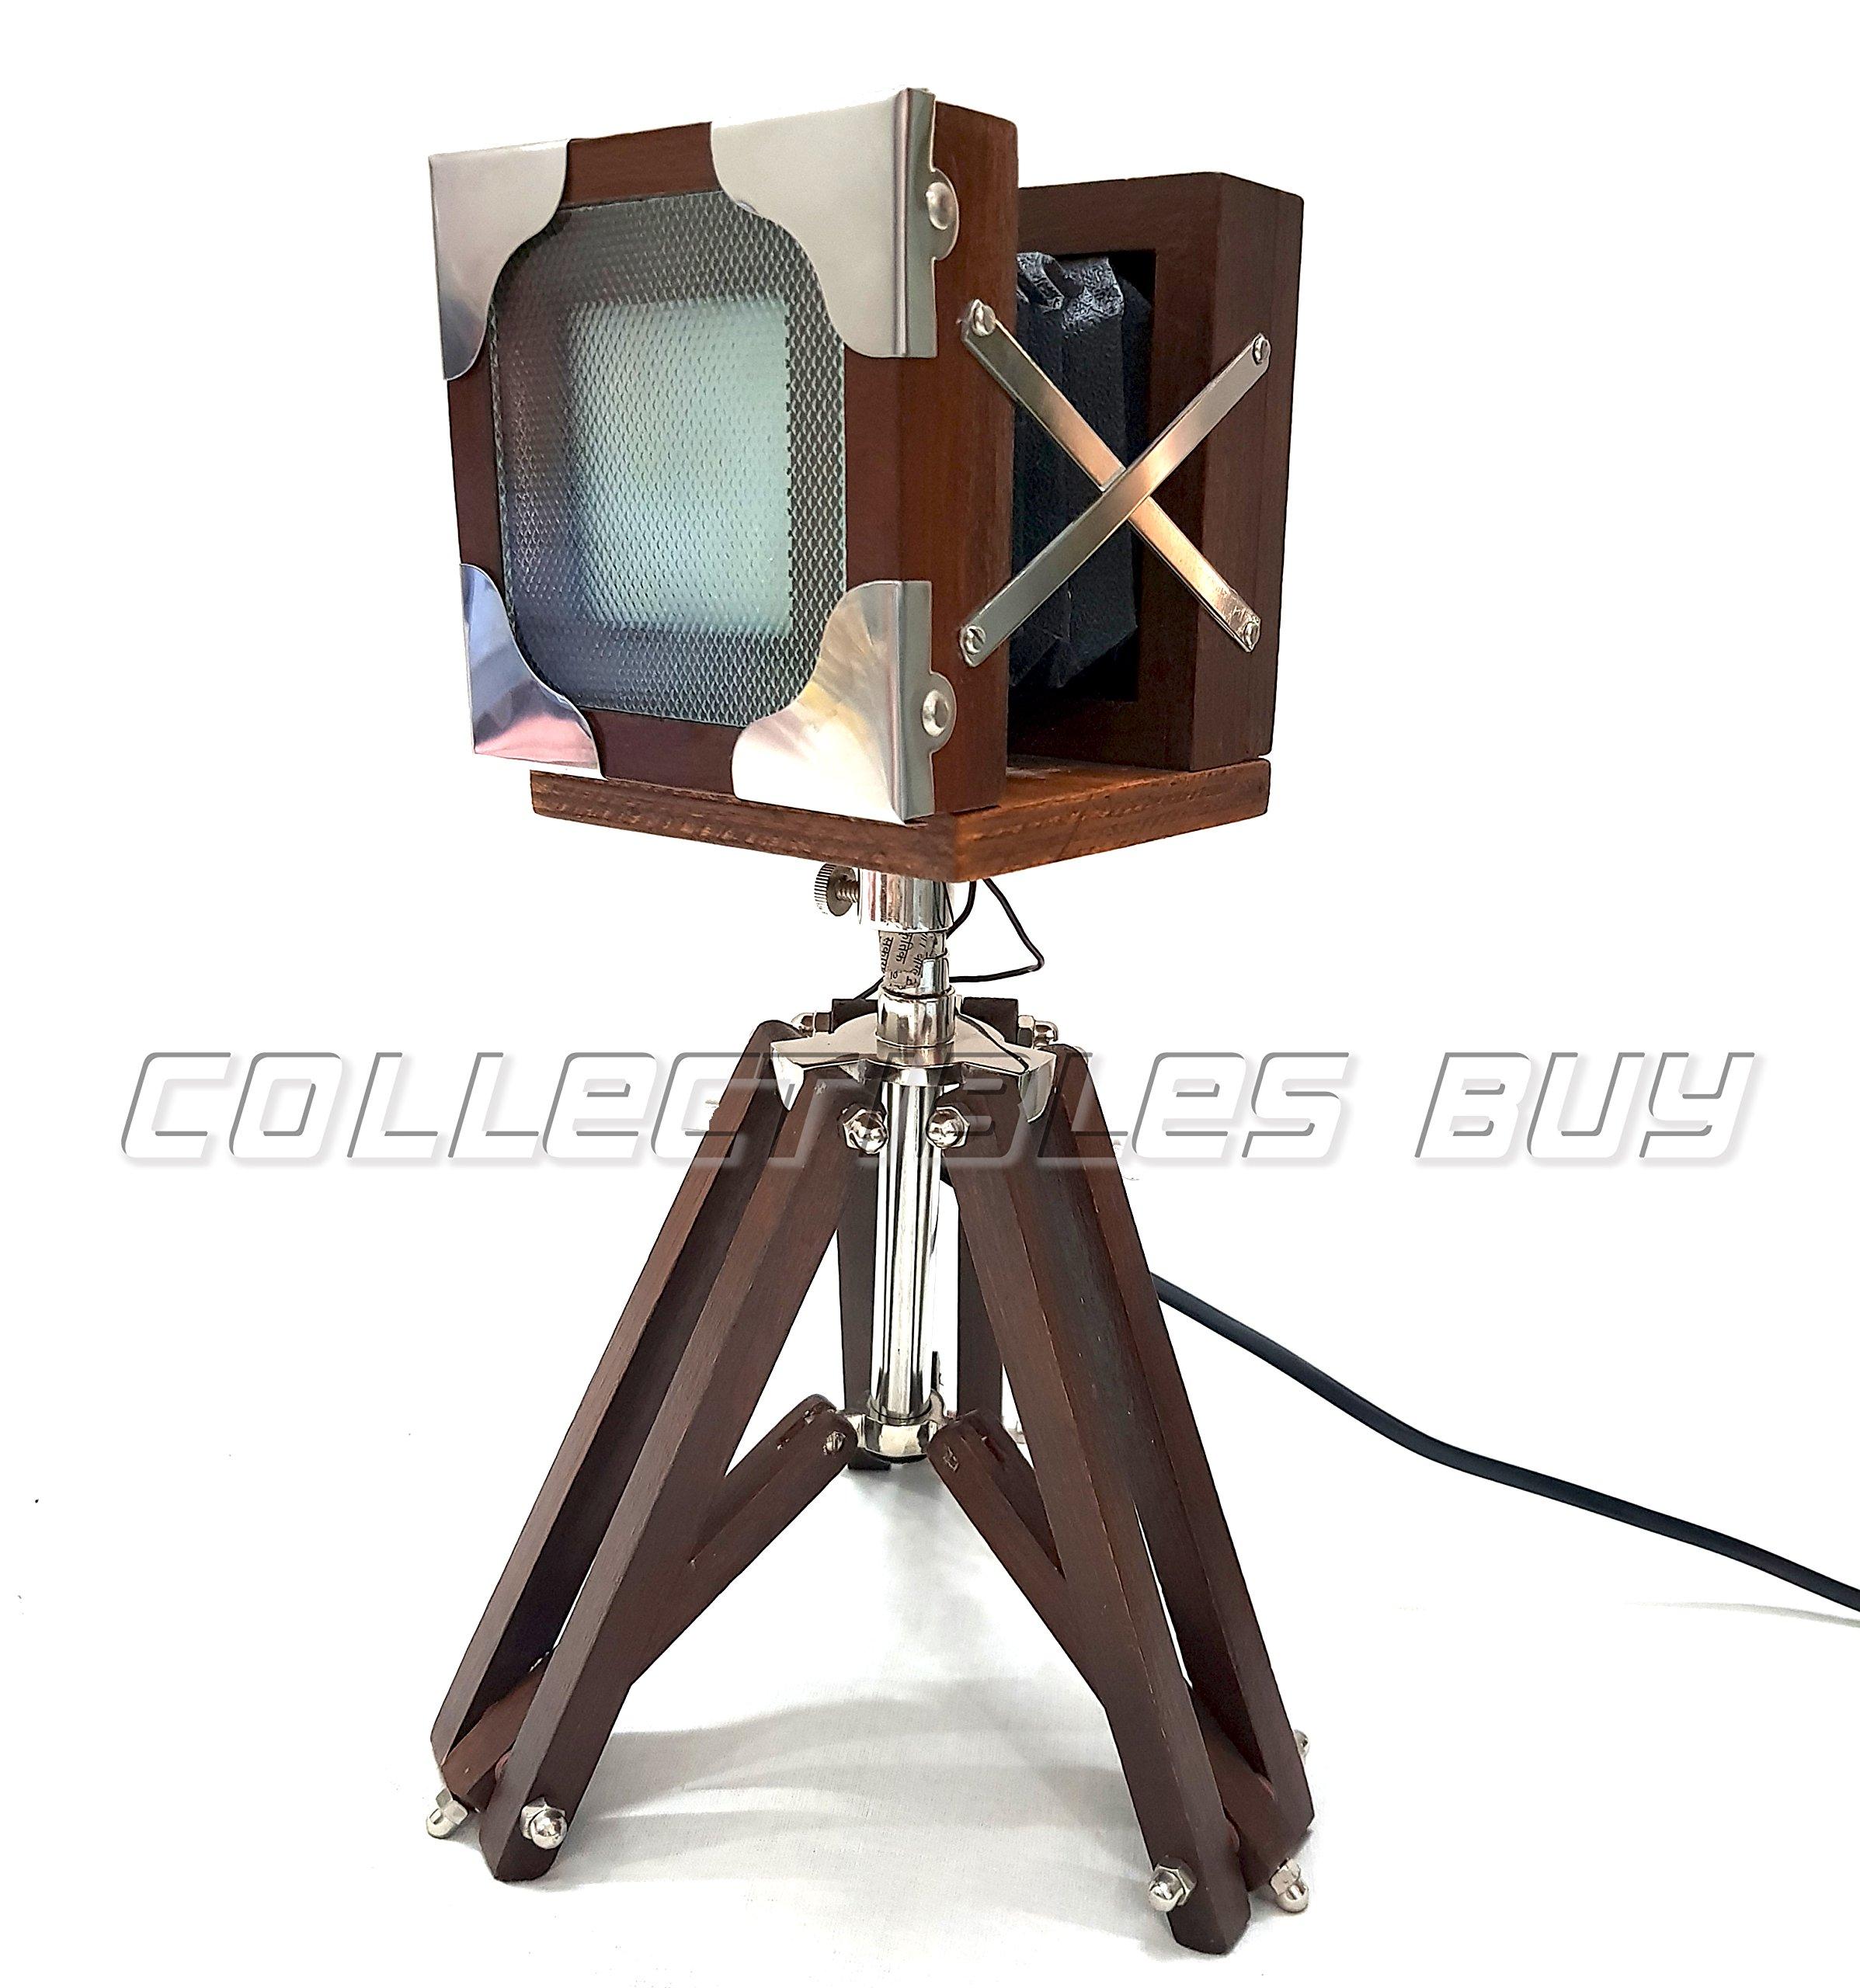 Collectibles Buy Antique Vintage Tripod Camera LED Desk Lamp Functional LED Panel 12 Watt Home & Office Desktop Lighting Decor Retro Design Movie Folding Camera Look Cooperate & Business Gift